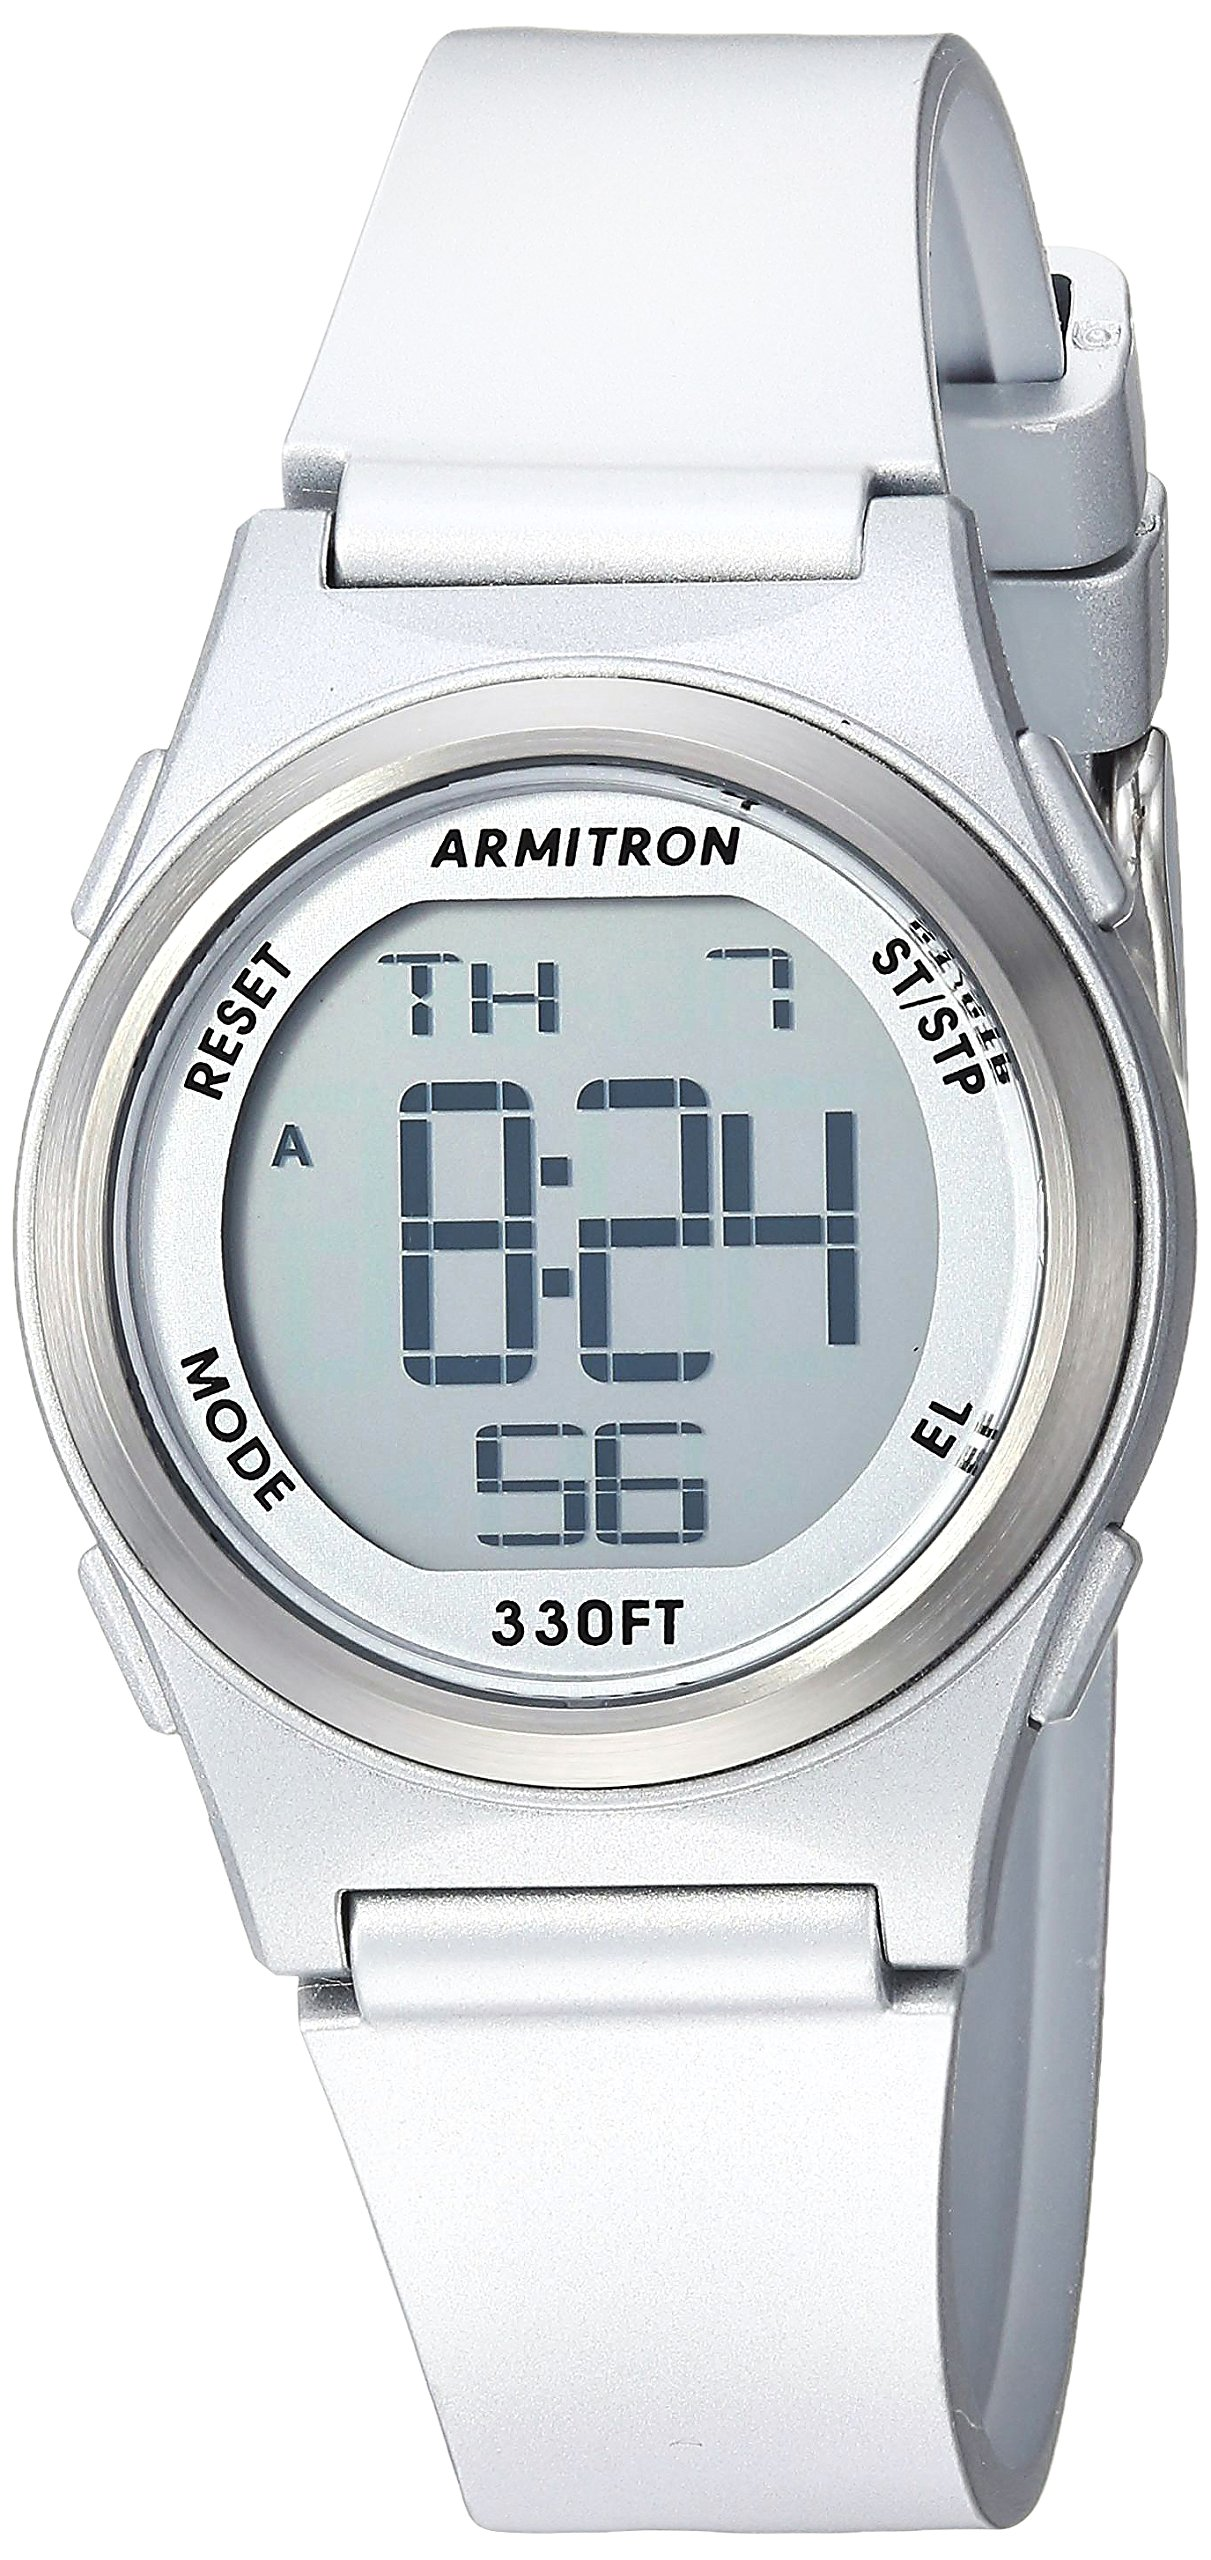 Armitron Sport Women's Digital Chronograph Silver-Tone Resin Strap Watch by Armitron Sport